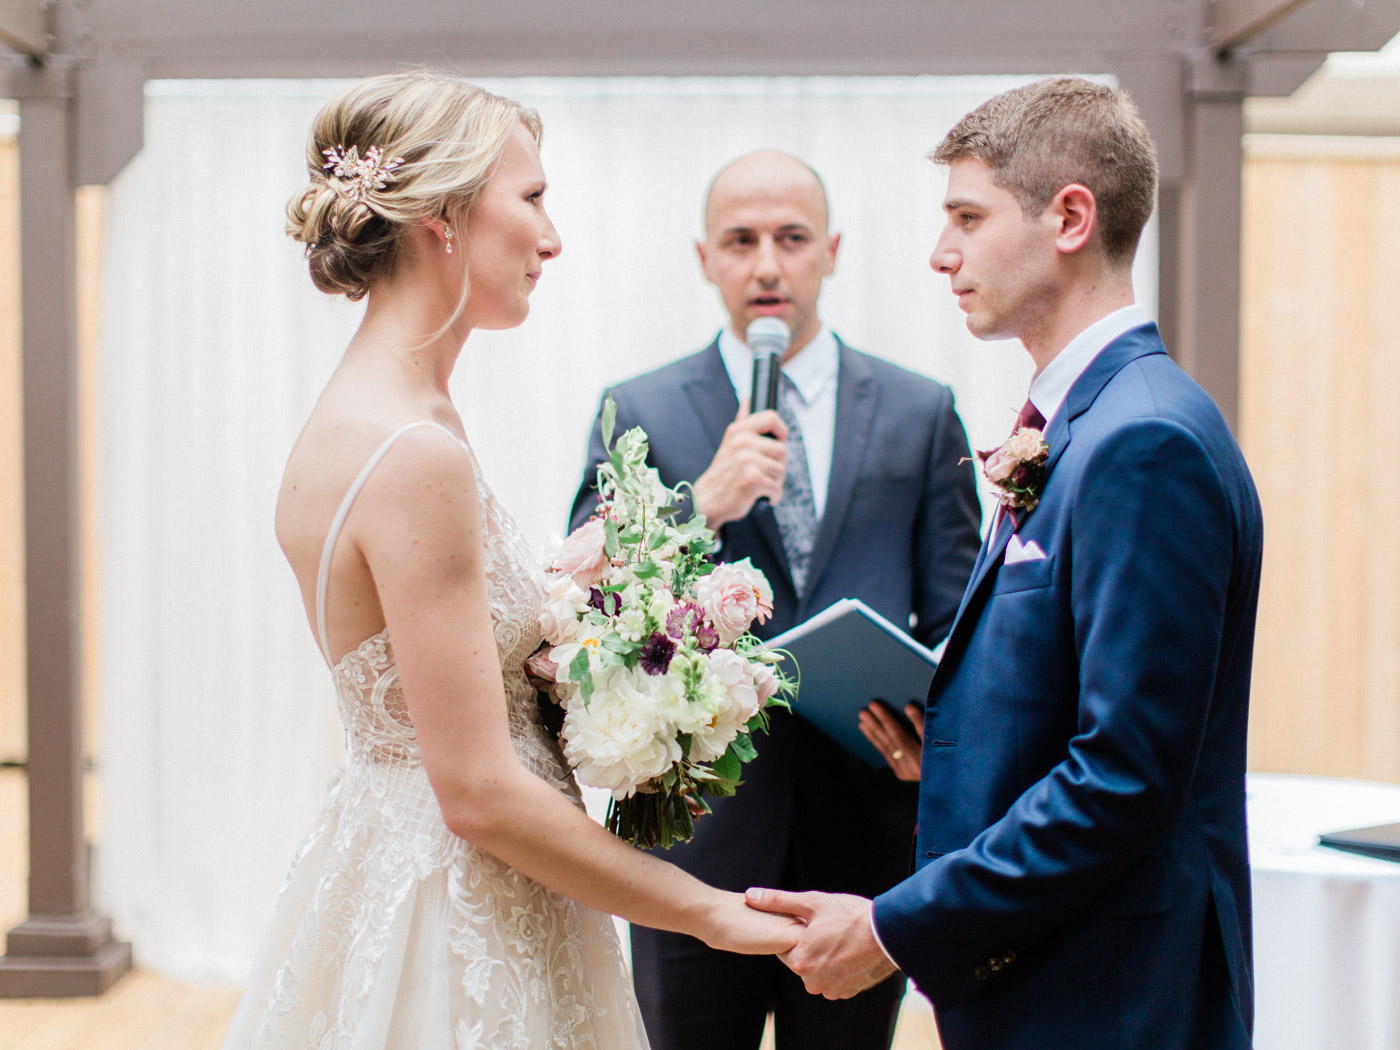 downtown-toronto-wedding-photographer-berkley-fieldhouse-blush-352.jpg